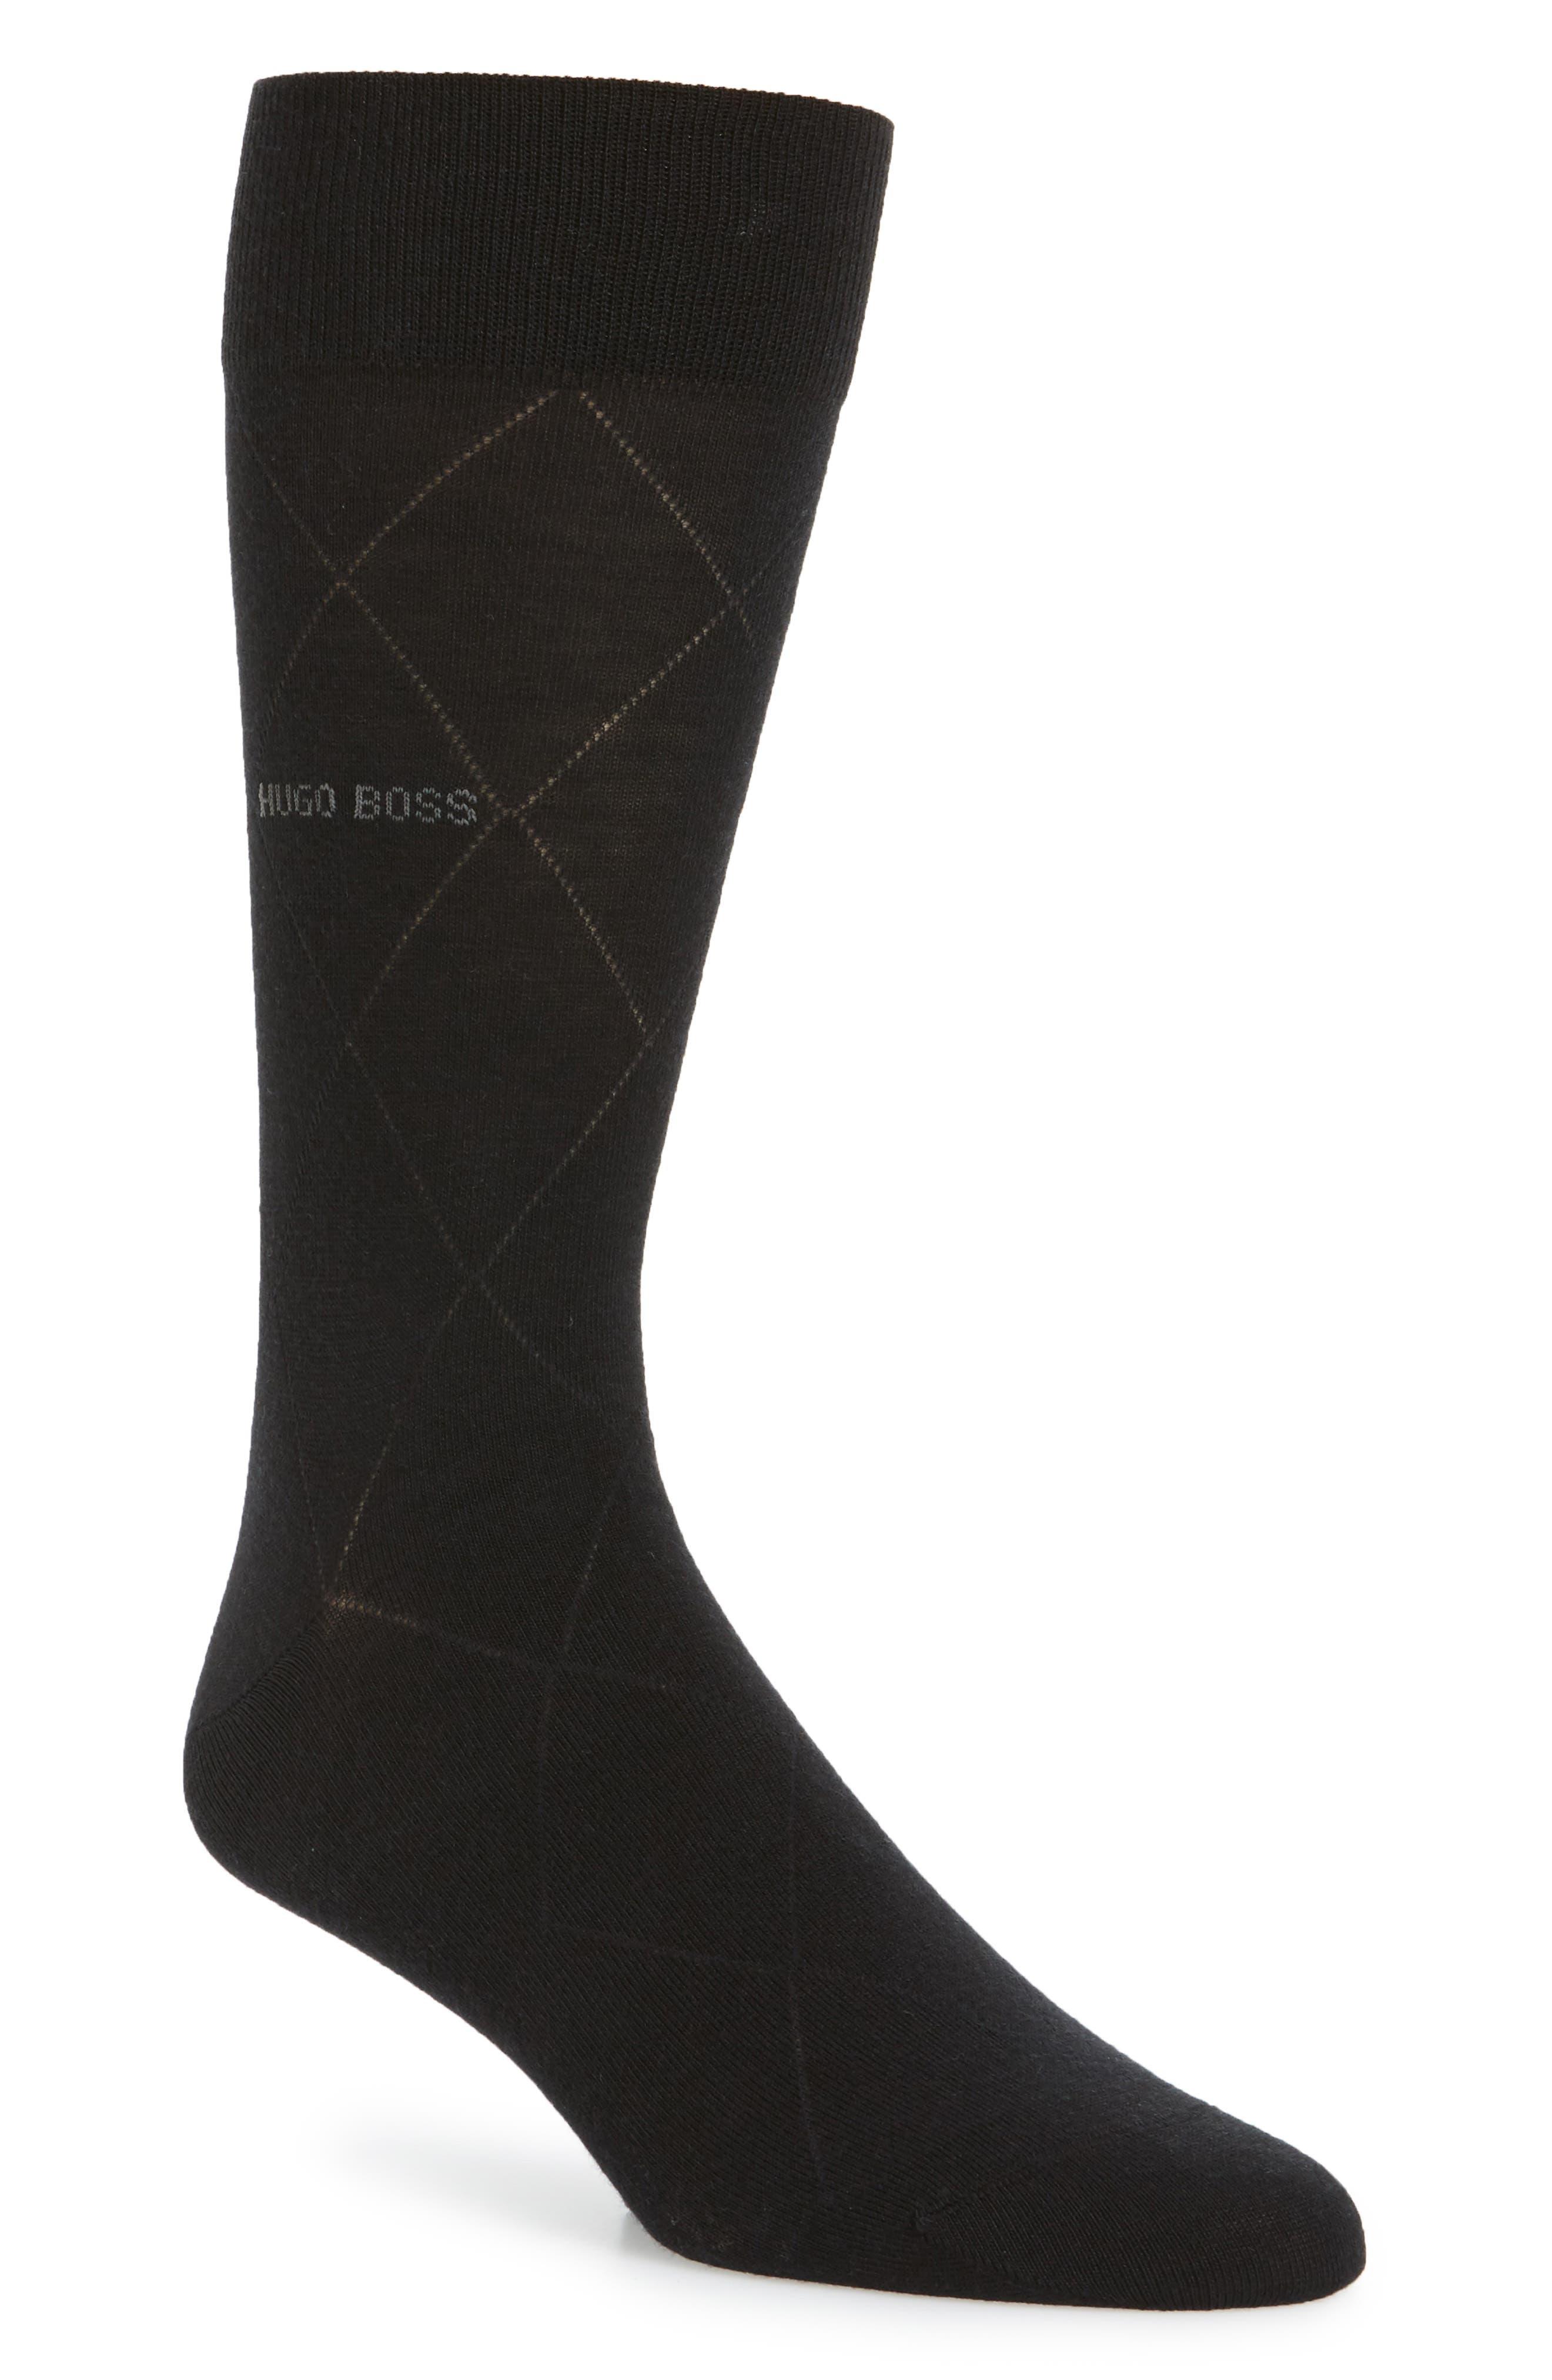 Argyle Crew Socks,                             Main thumbnail 1, color,                             001